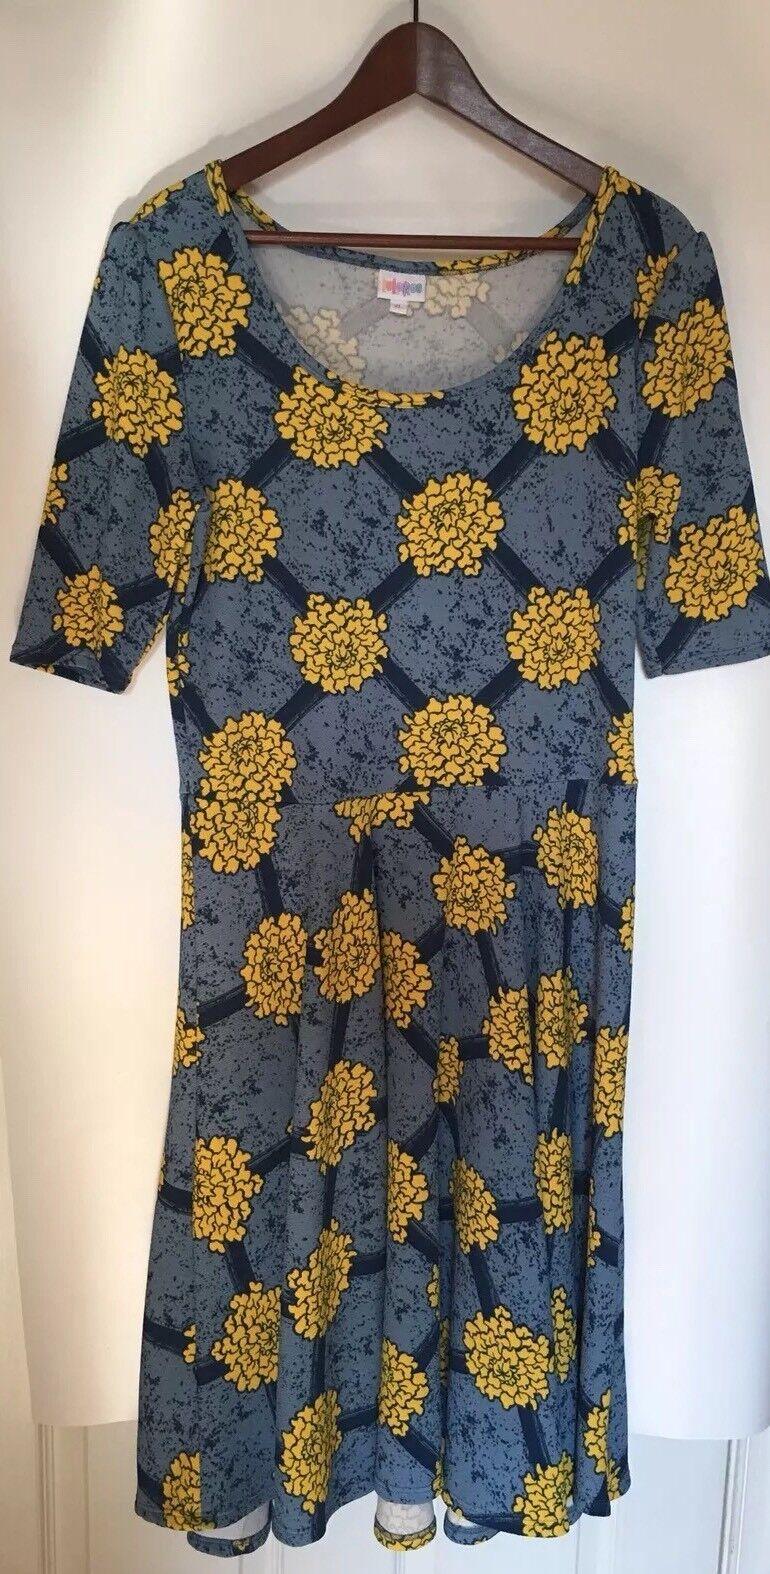 Lularoe Women's Dress Nicole bluee Yellow  Marigold Pattern  Size XLarge